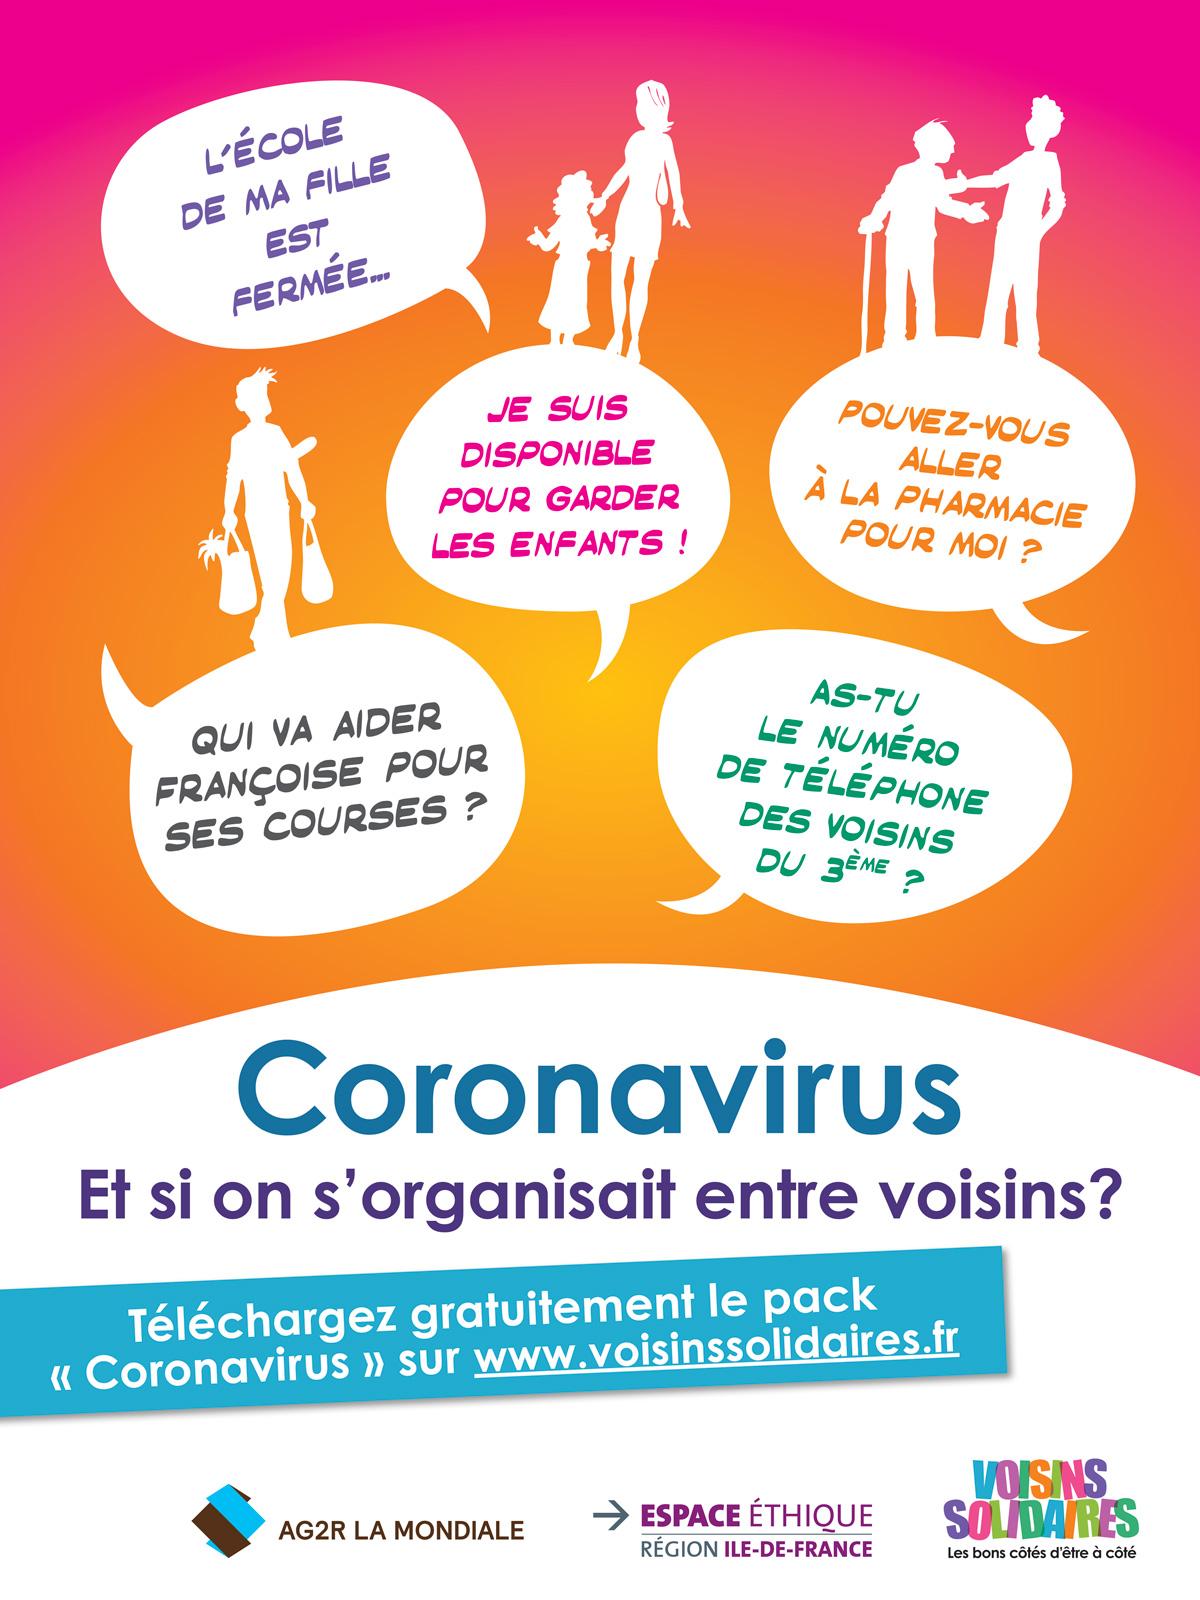 Affiche Coronavirus voisins solidaires